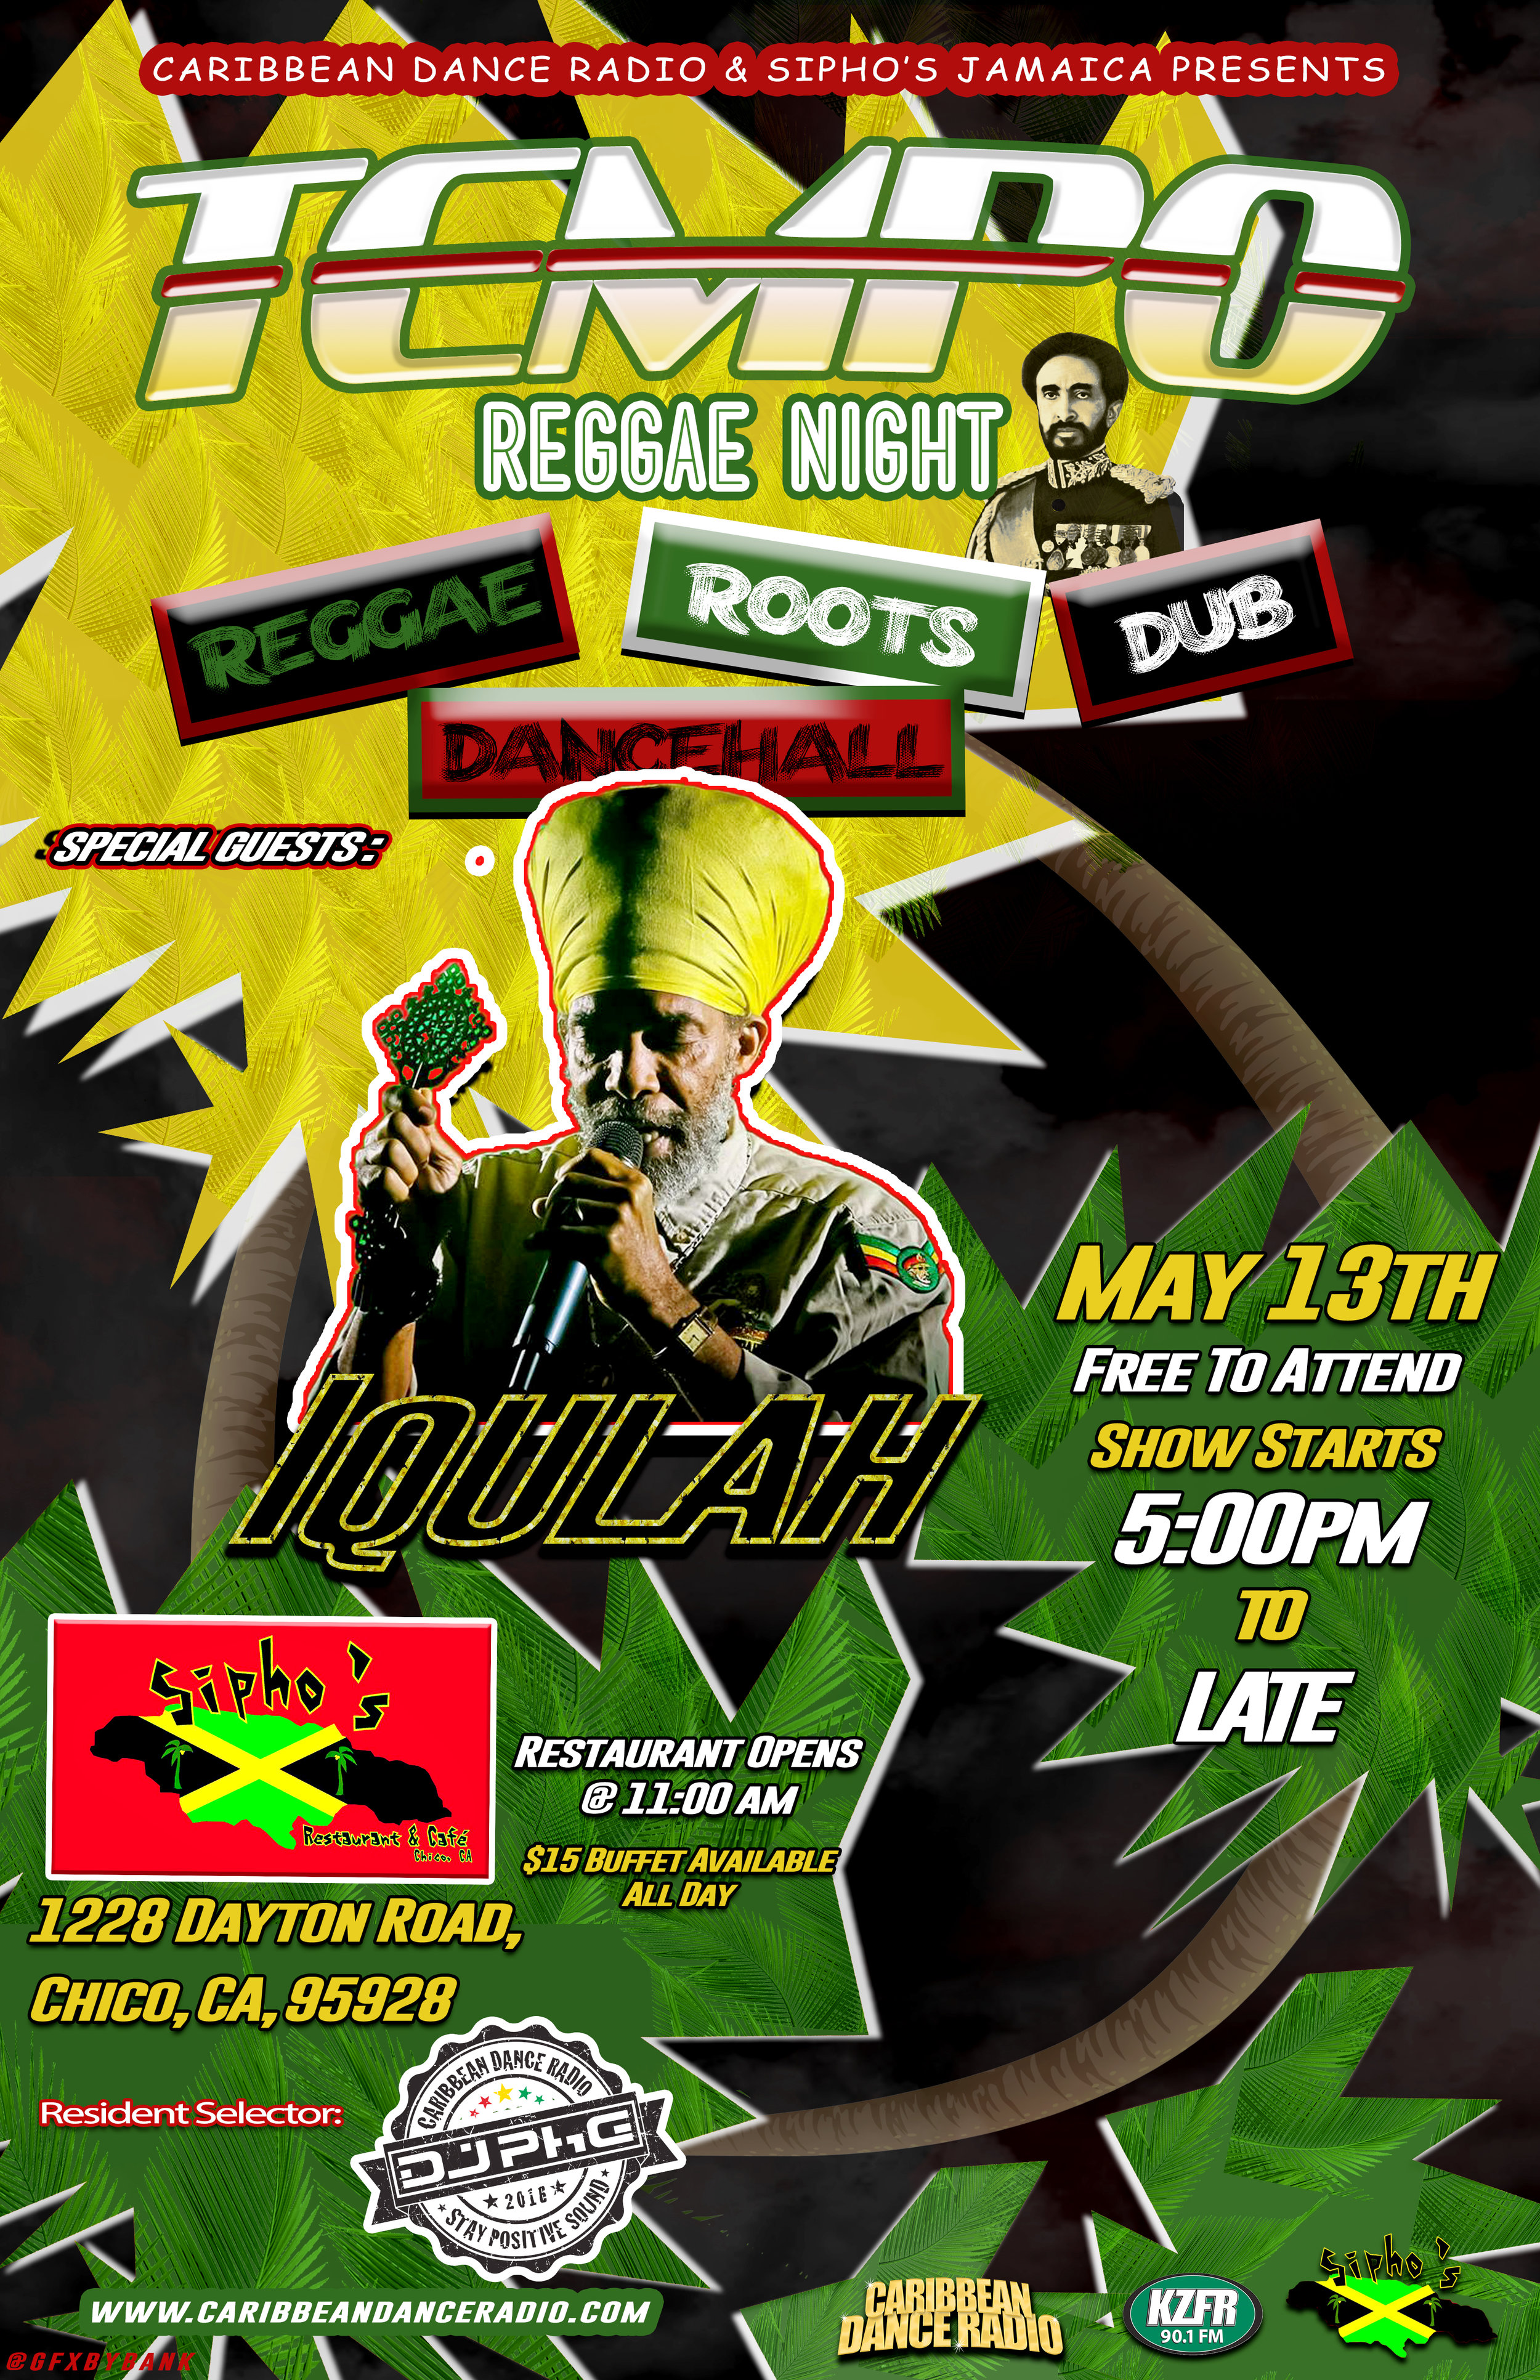 Tempo May 2017 iqulah caribbean dance radio.jpg